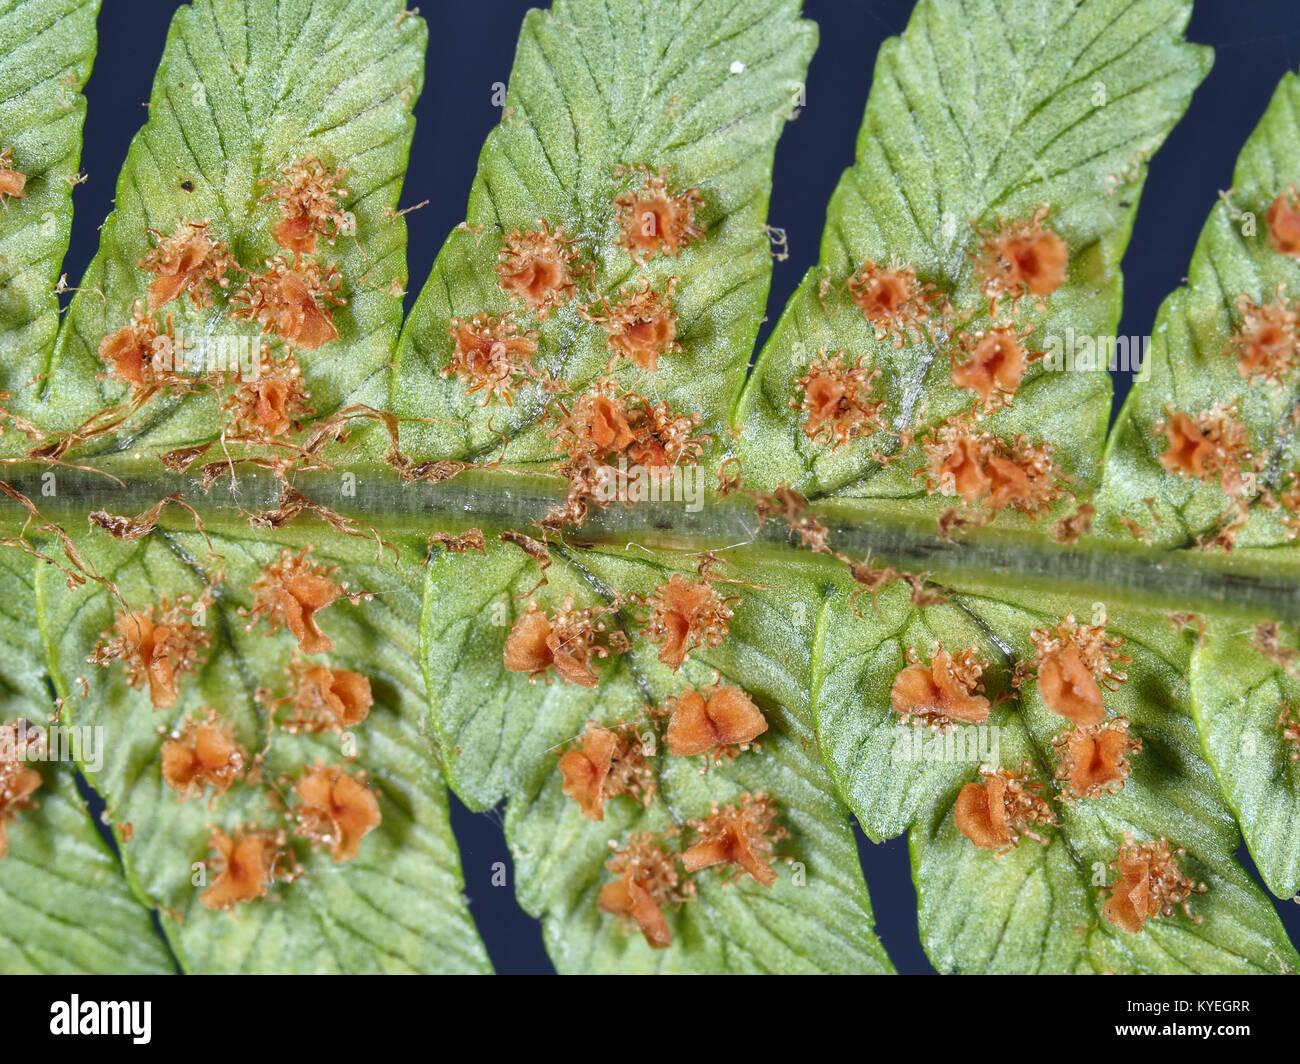 Underside of a fern leaf, showing multiple sori Stock Photo